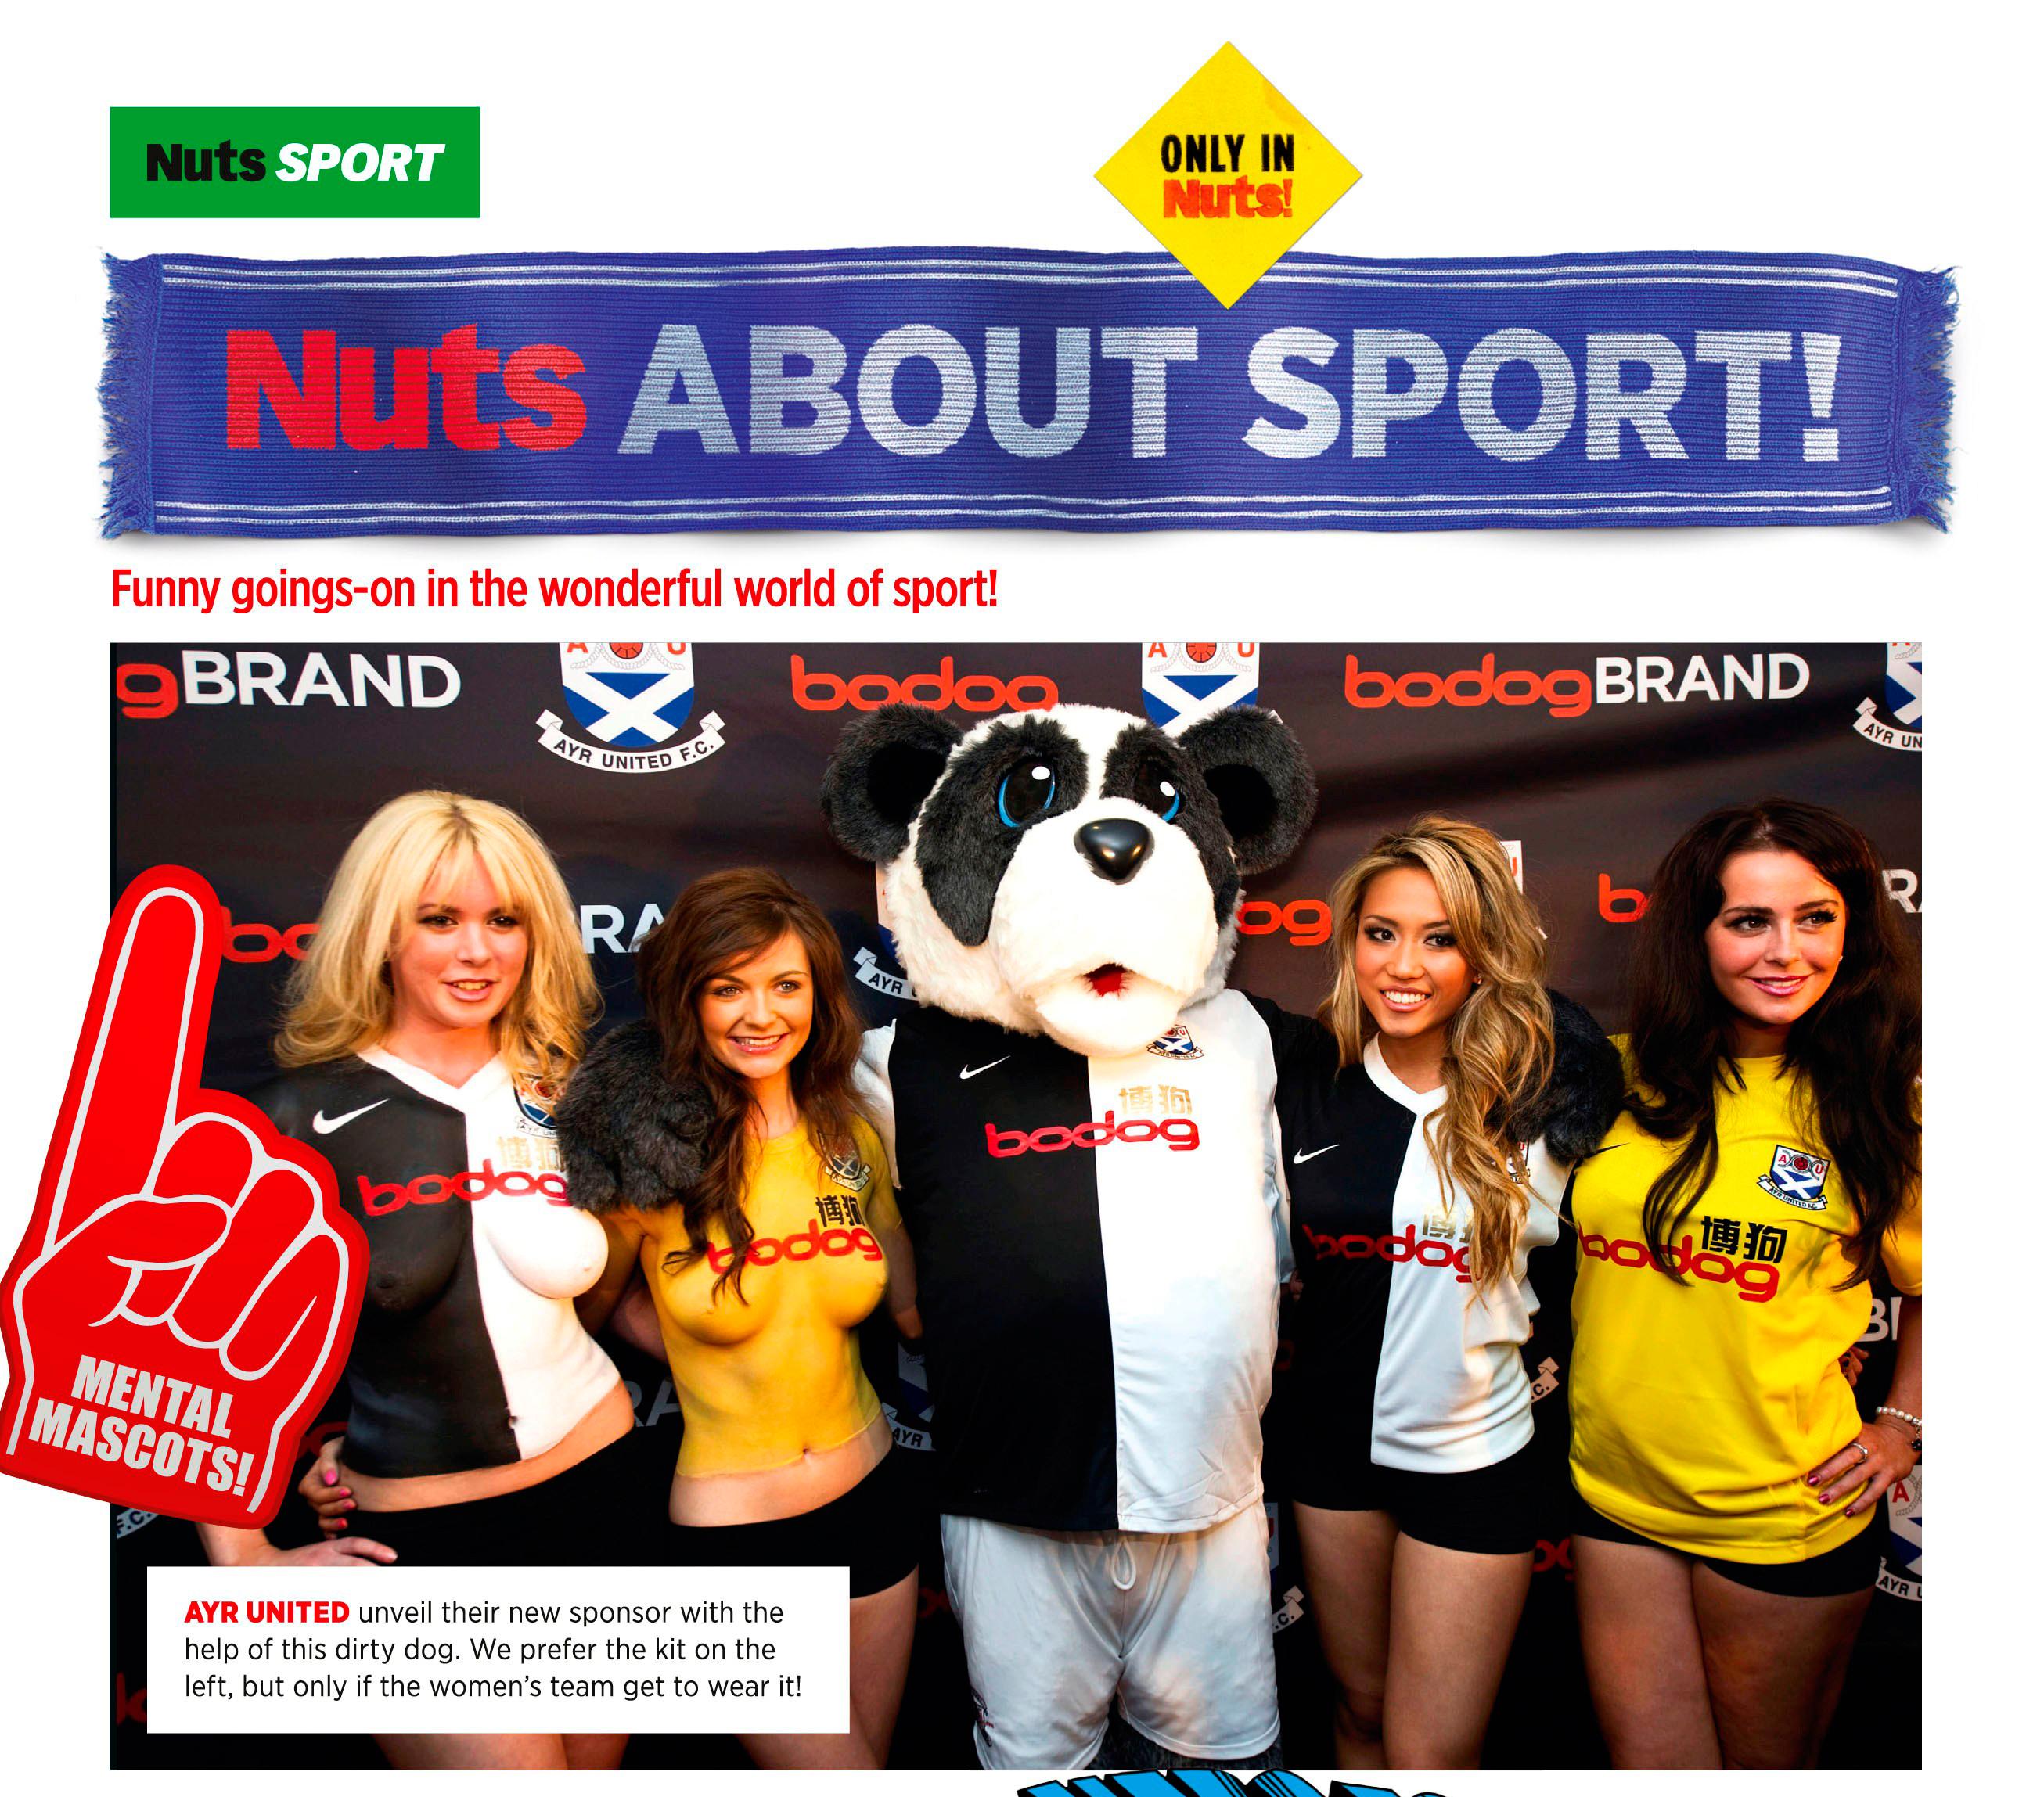 ayr-united-unveils-new-sponsor